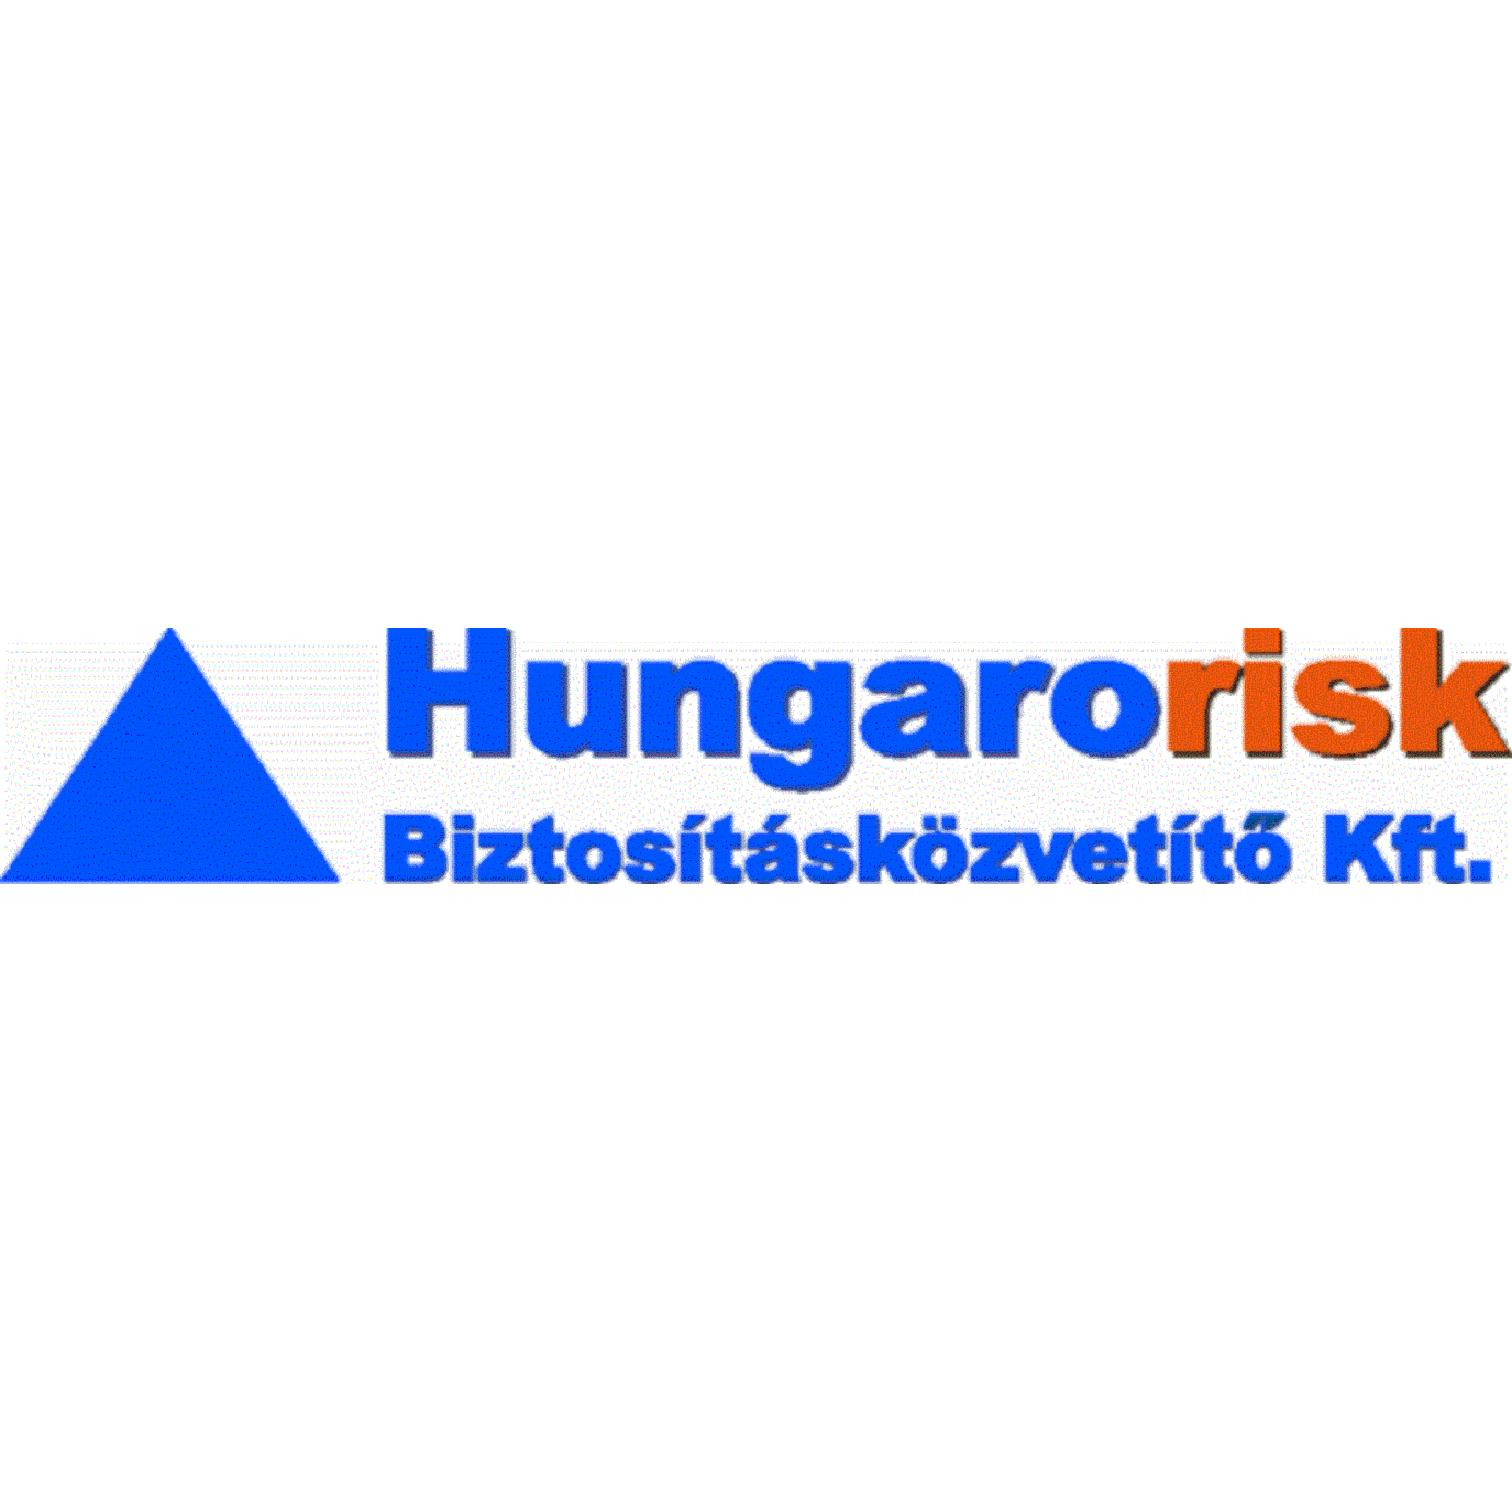 Hungarorisk Kft.